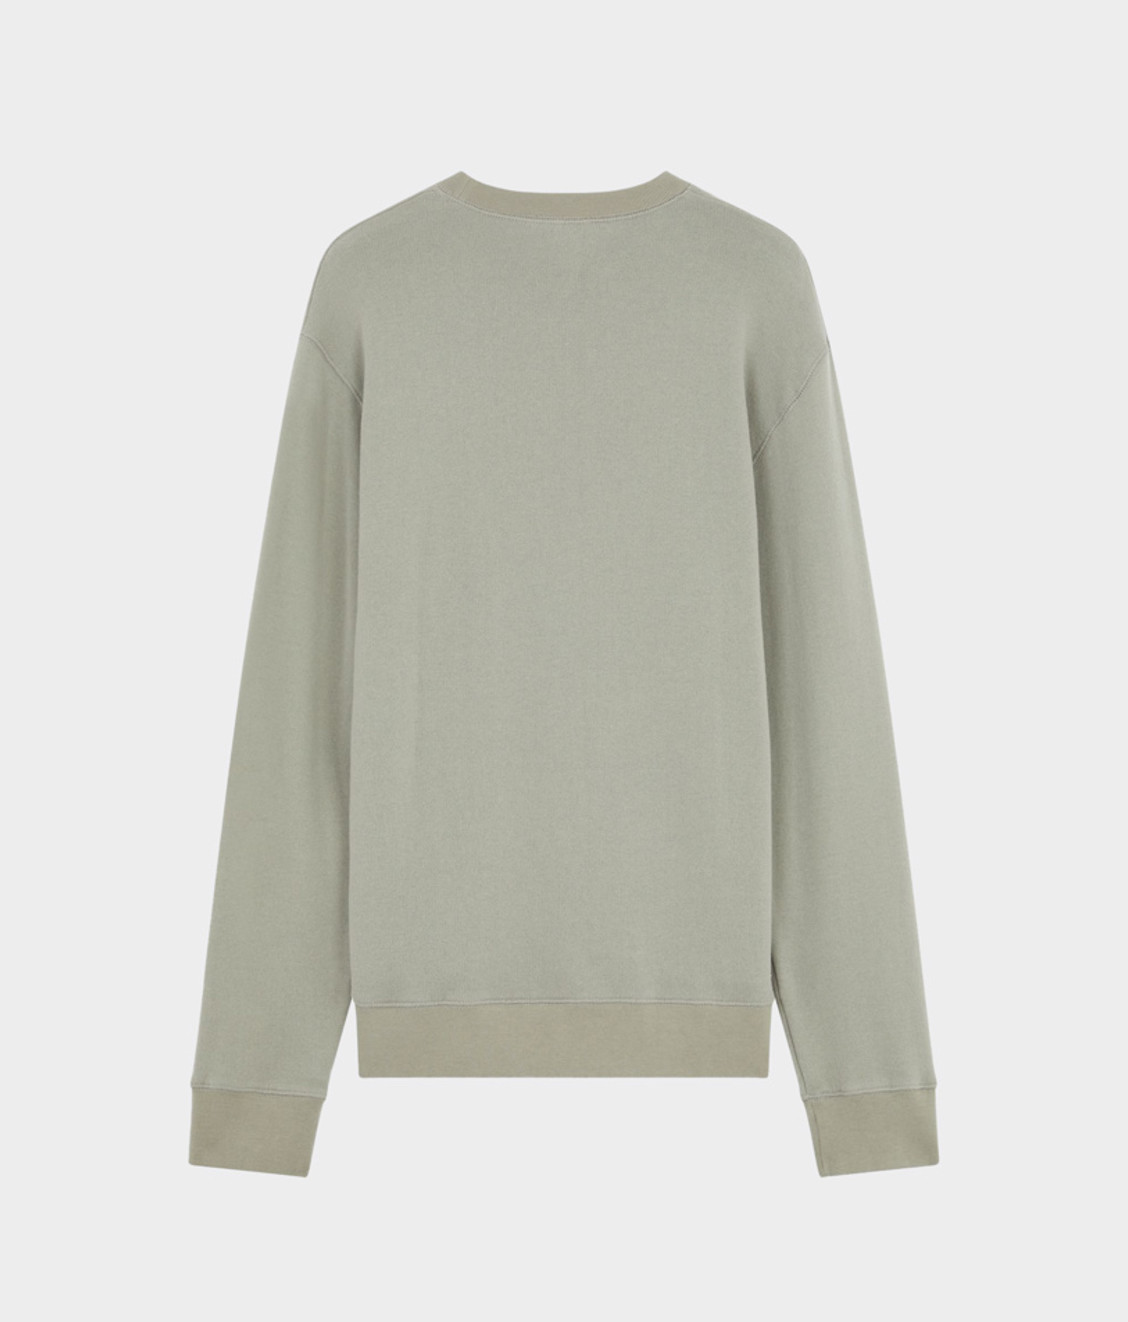 Maison Kitsune Maison Kitsune Sweatshirt Light Grey